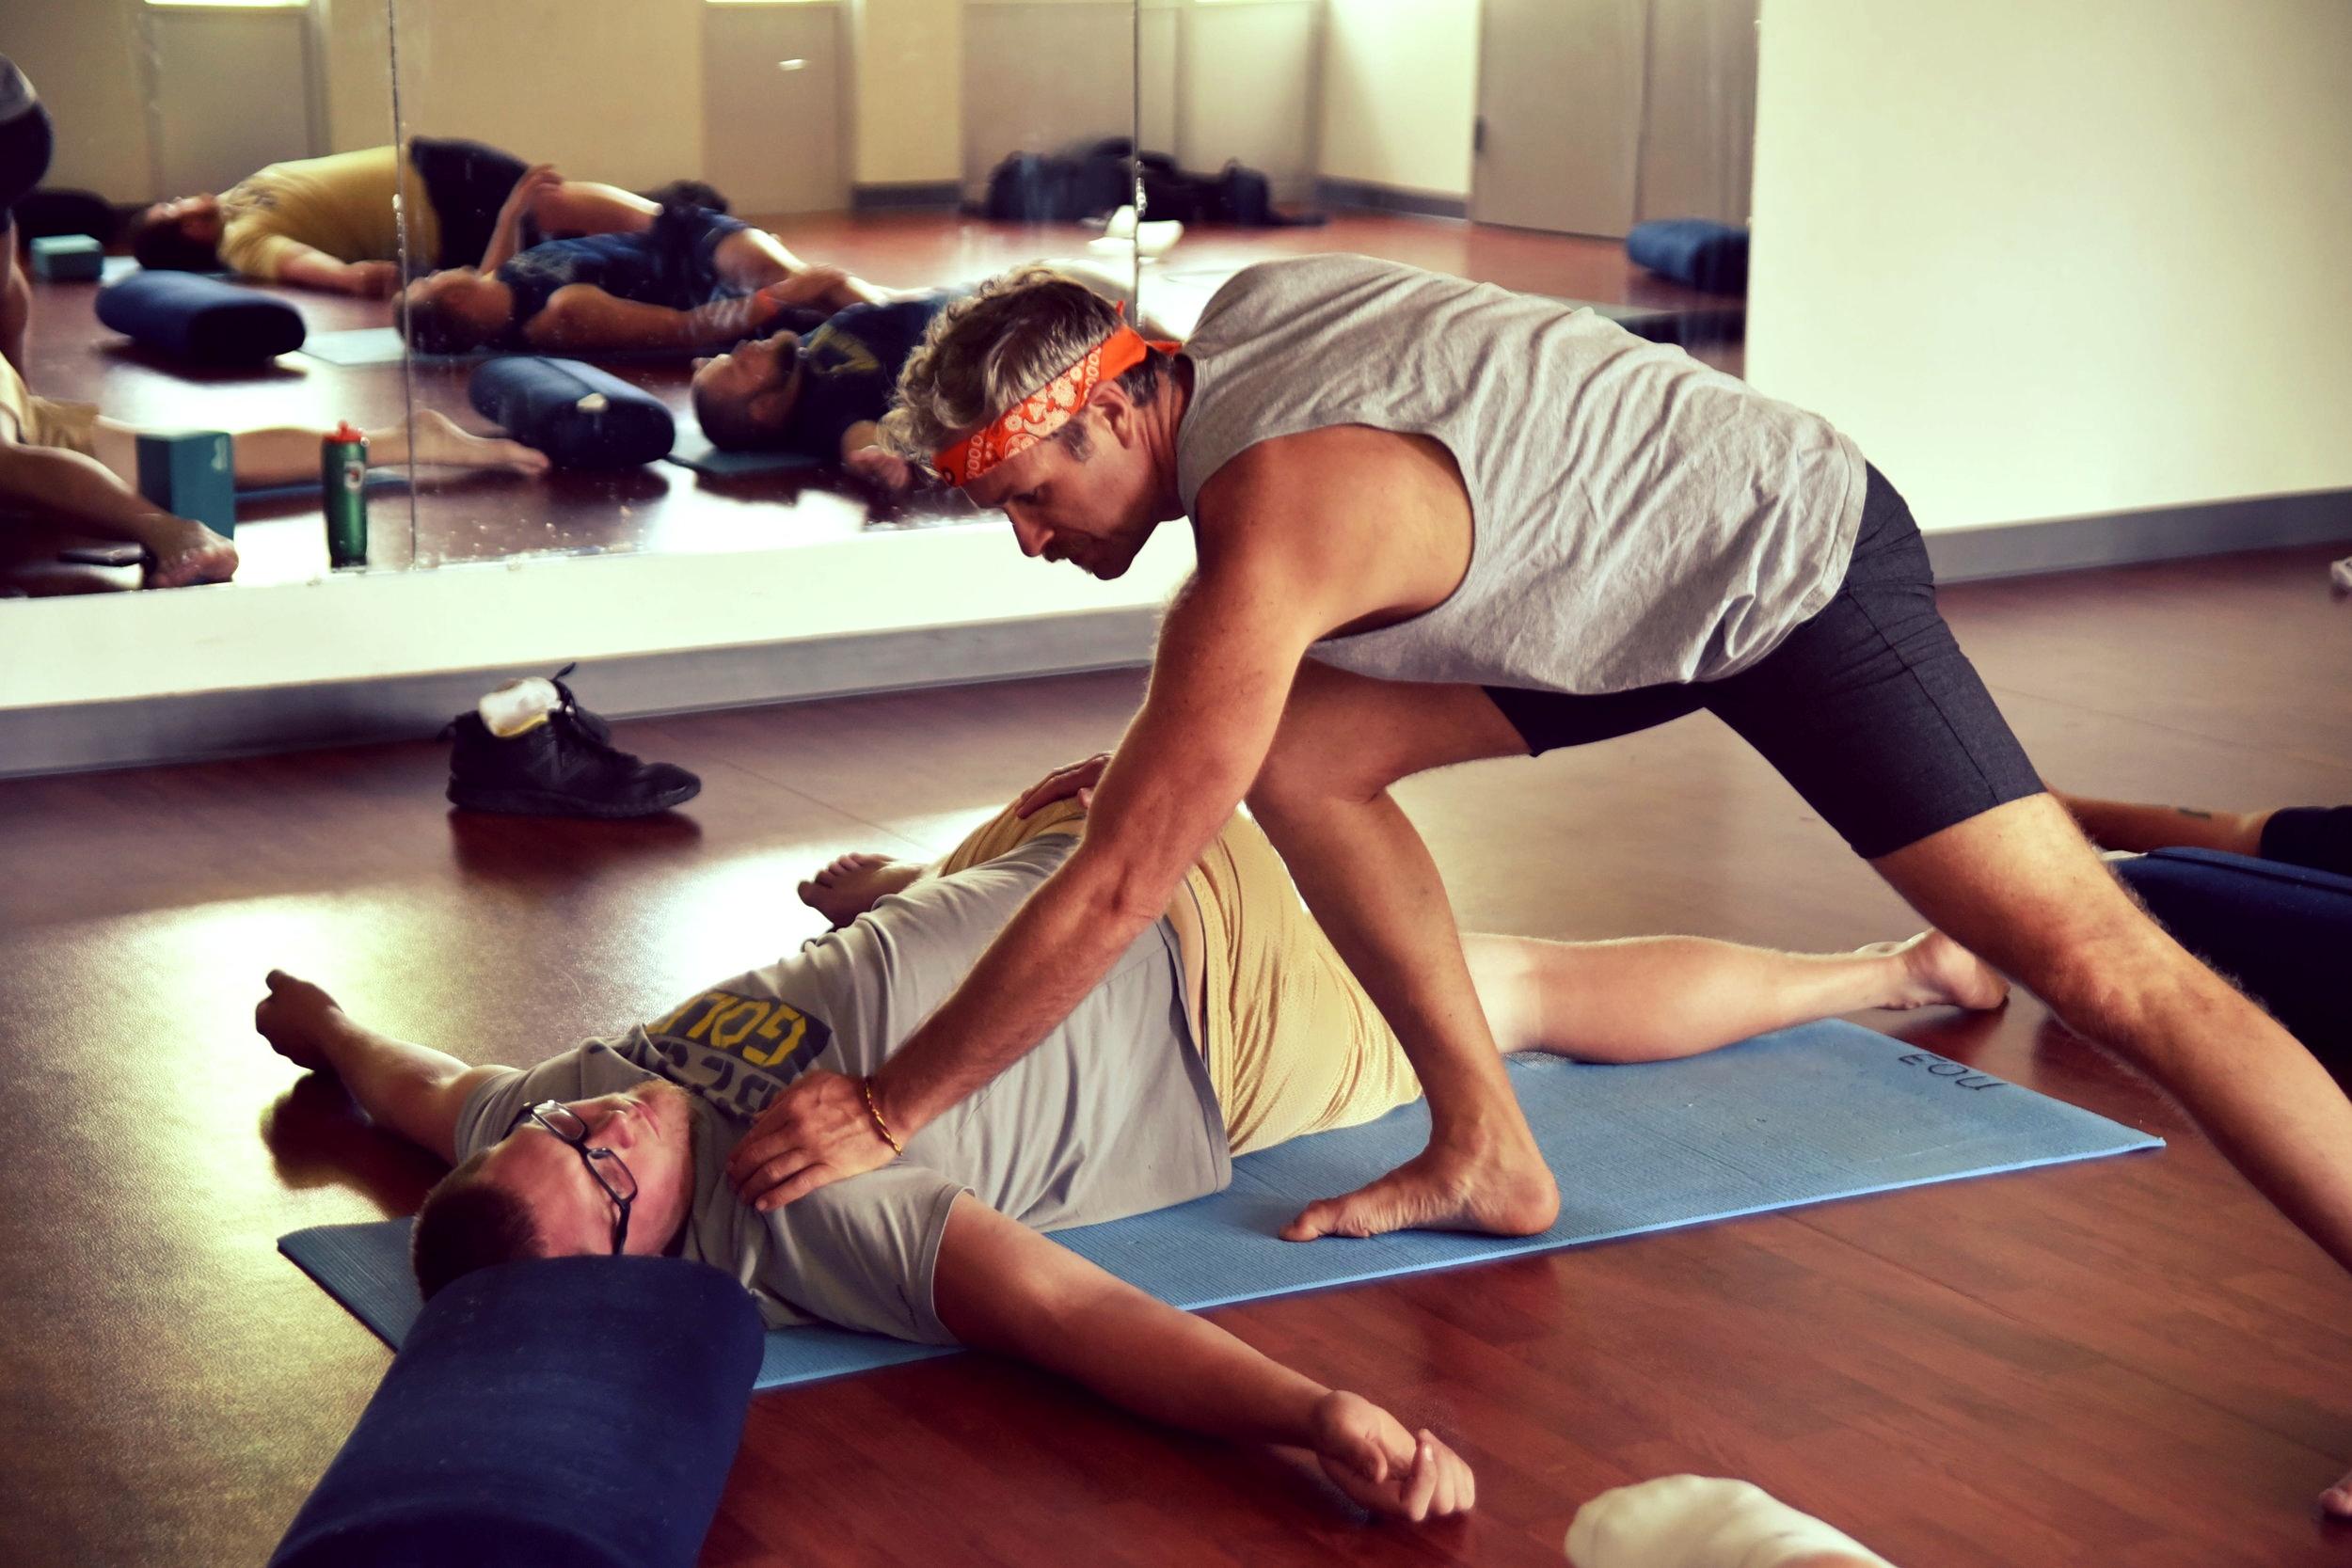 The Kula Dudes Program - Building brotherhood through yoga.